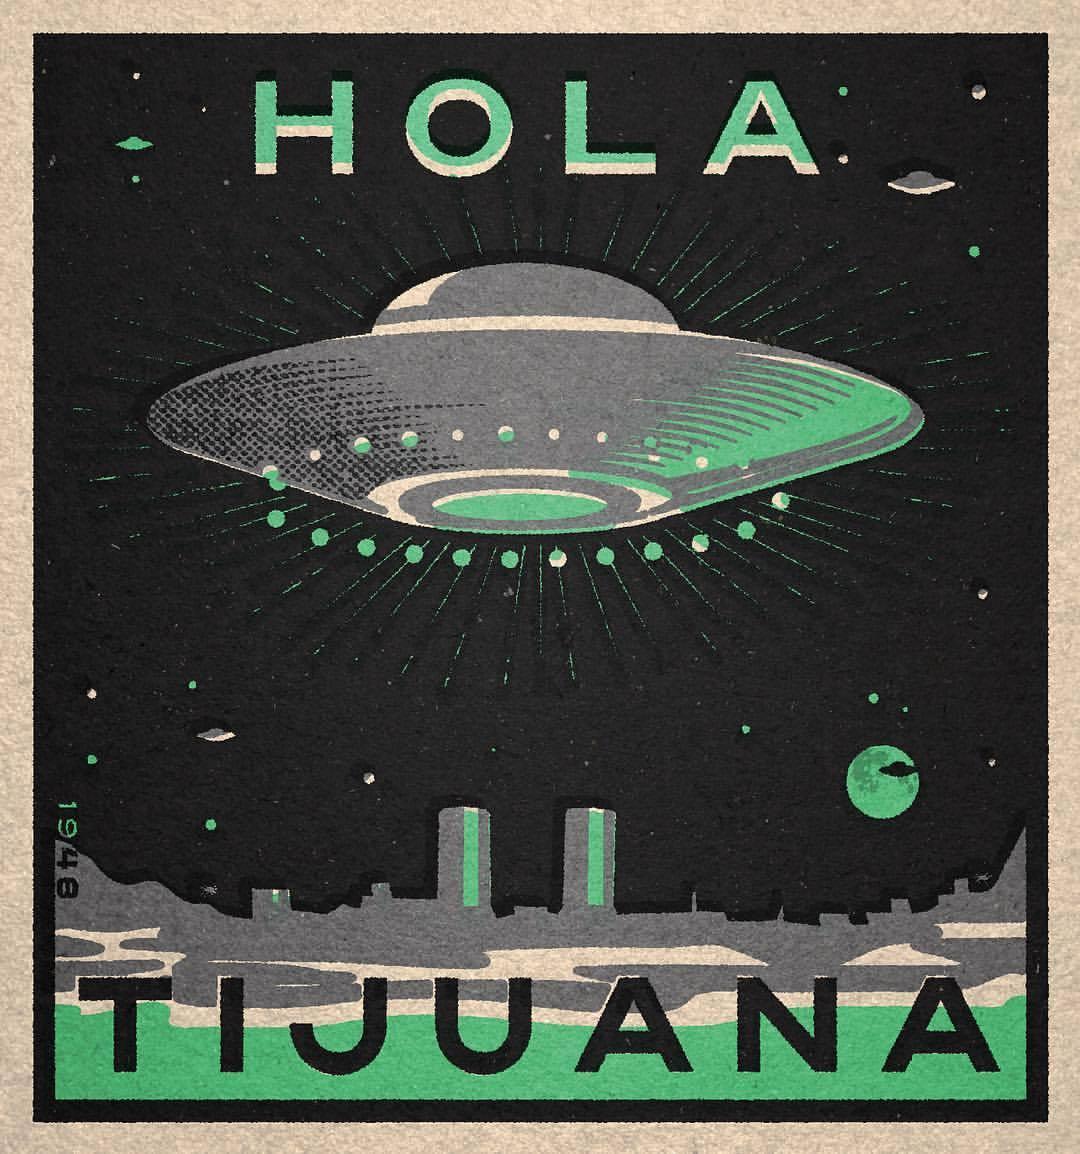 HigherEd-AndyPitts-Place-Tijuana.jpg